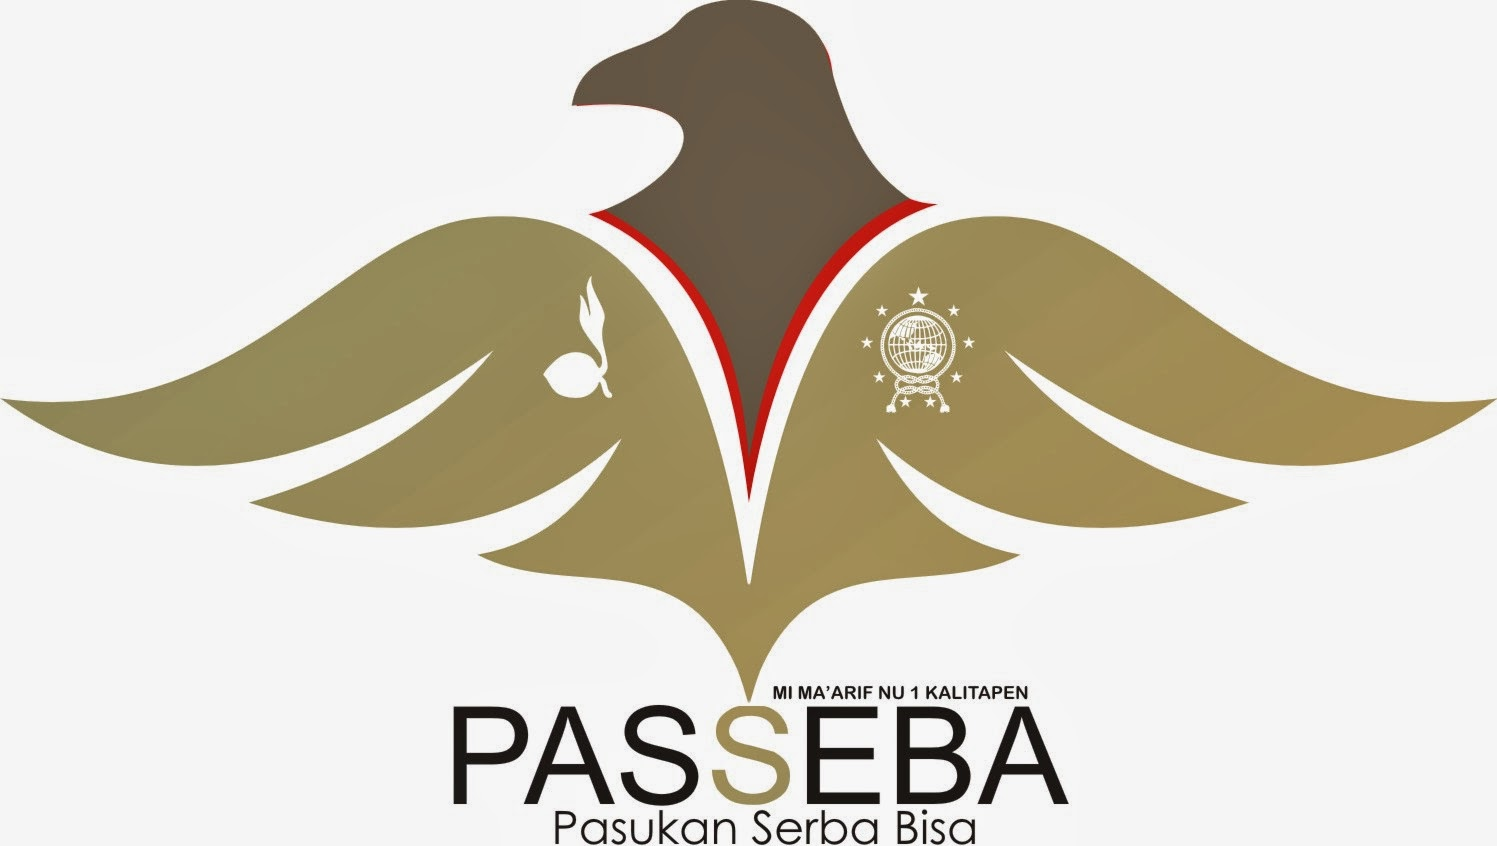 PASSEBA( PASUKAN SERBA BISA LOGO)